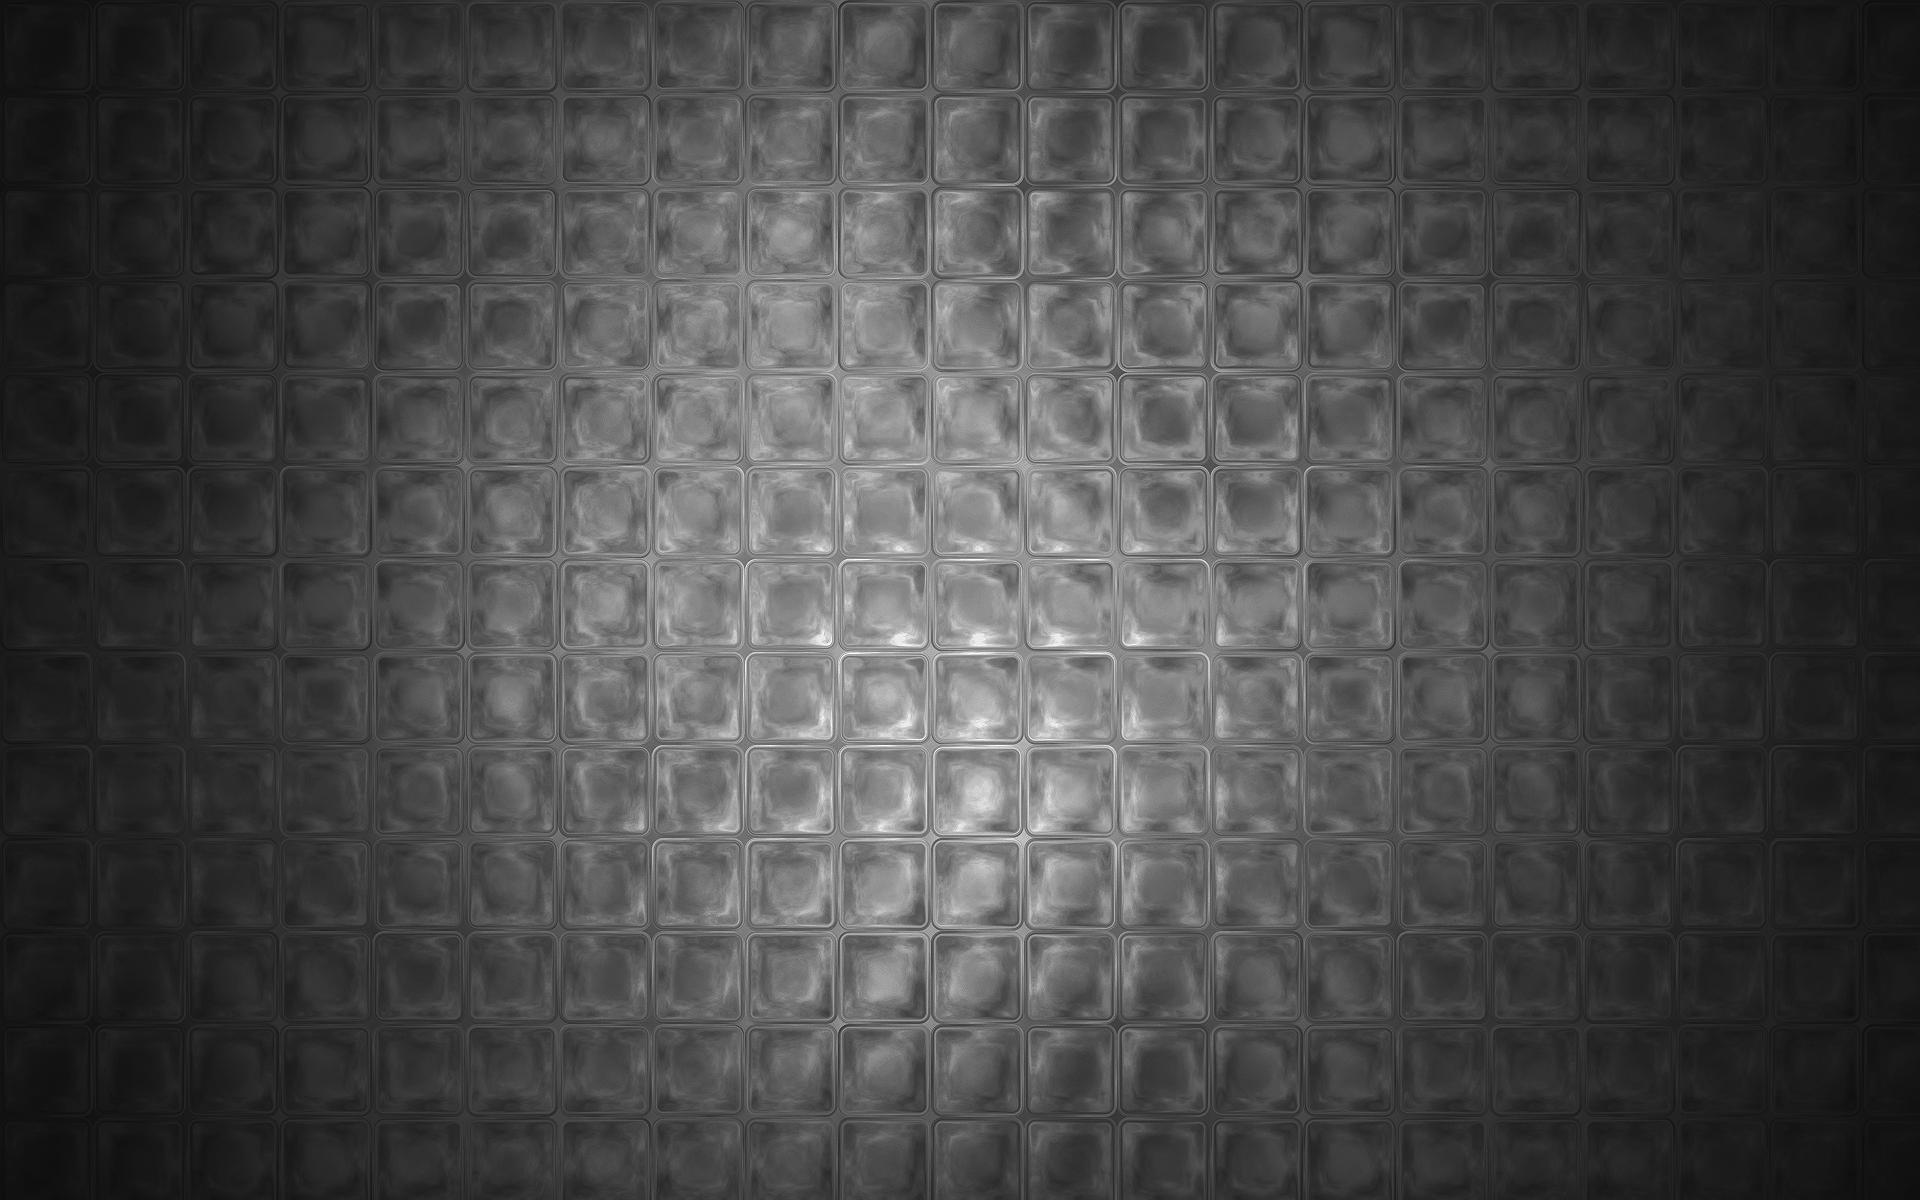 black glass by dexi811026 black glass by dexi811026 - Black Glass